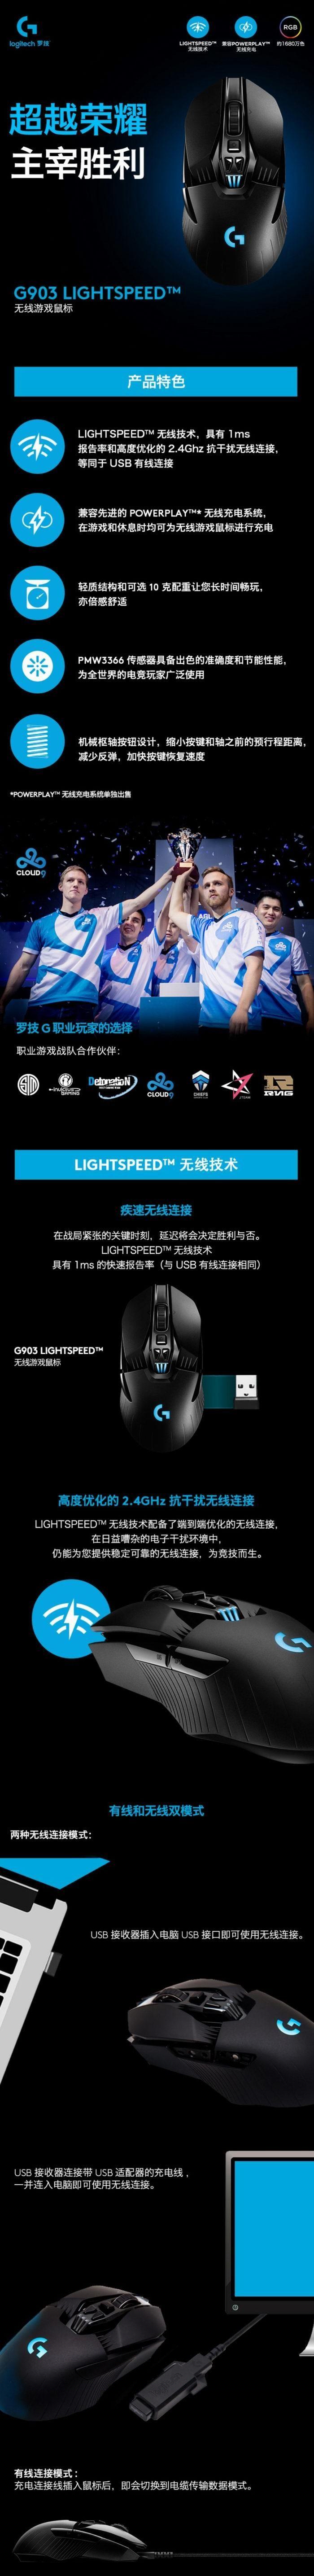 Logitech 罗技 G903 Lightspeed 无线游戏鼠标折 7.6折 129.99加元包邮!